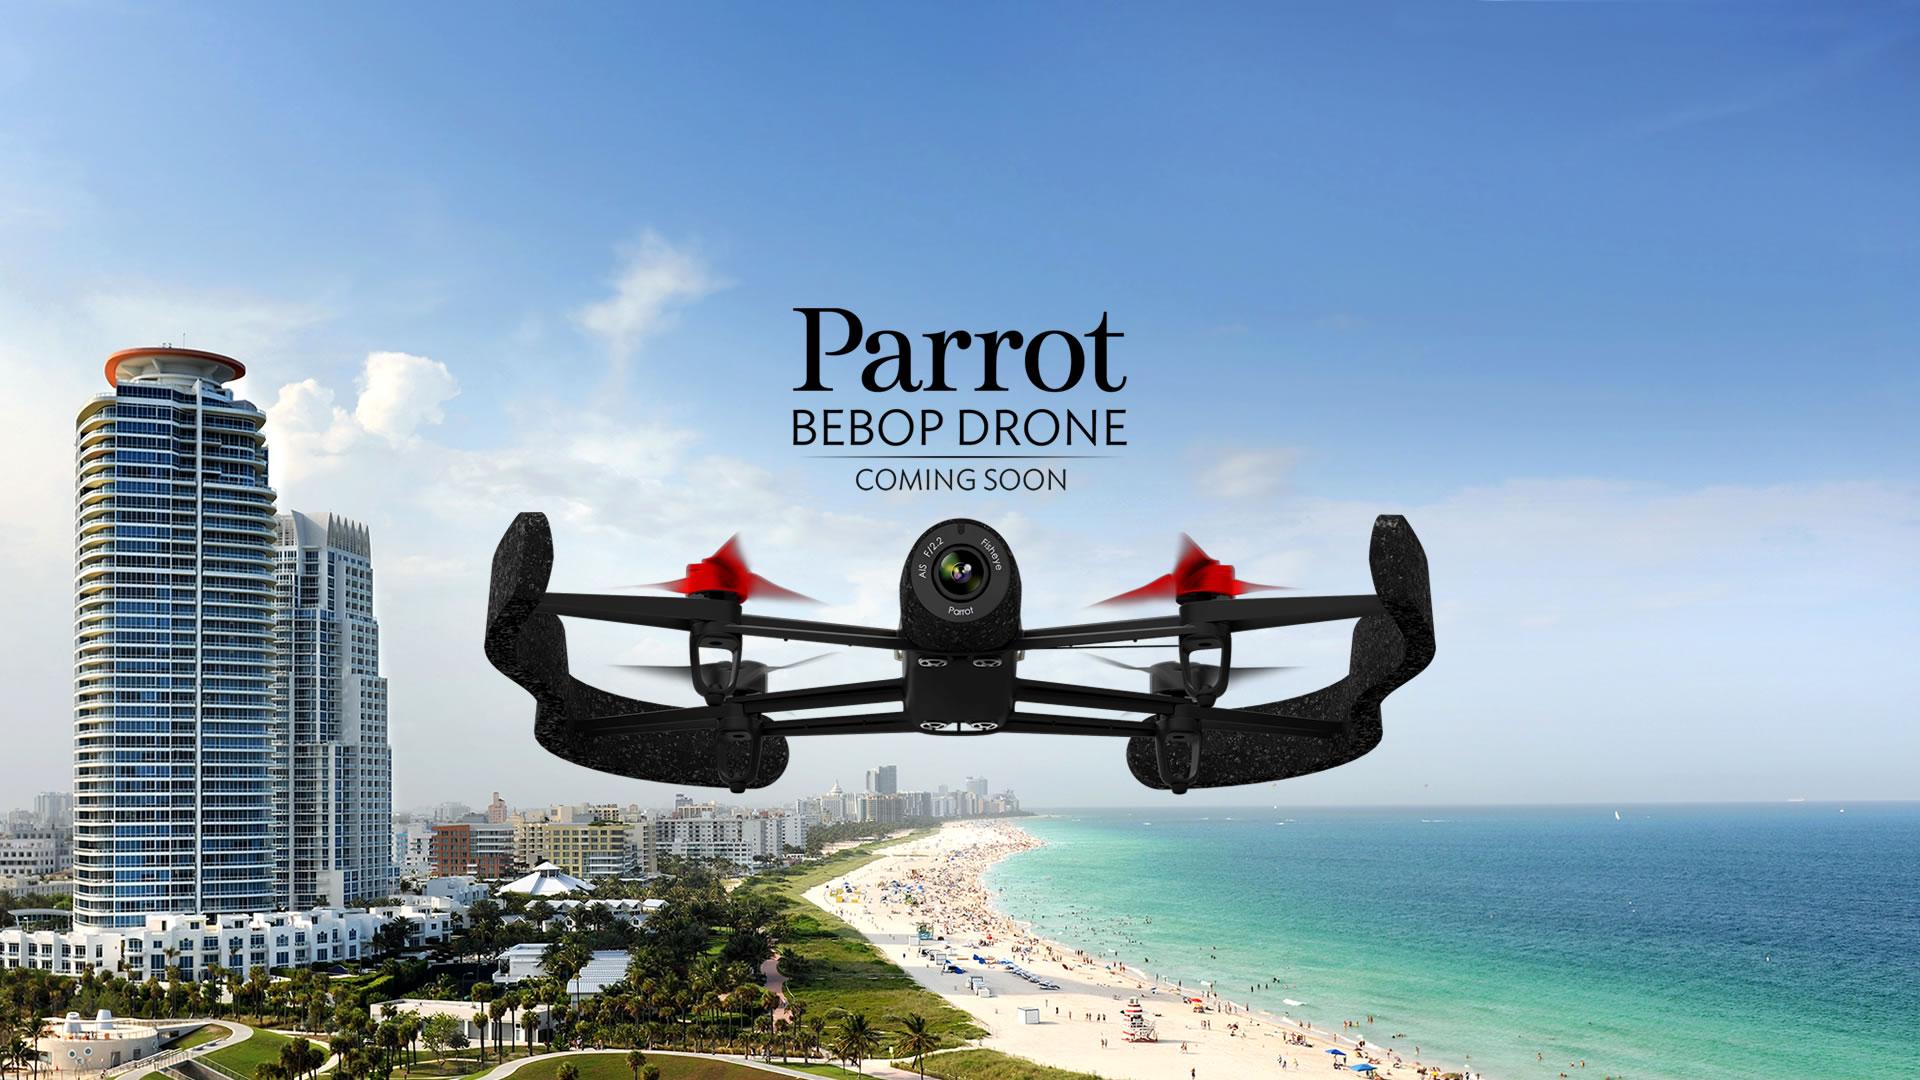 Parrot Bebop դրոնը նվաճել է Արկտիկայի տիրույթներն ու Բերինգի նեղուցը